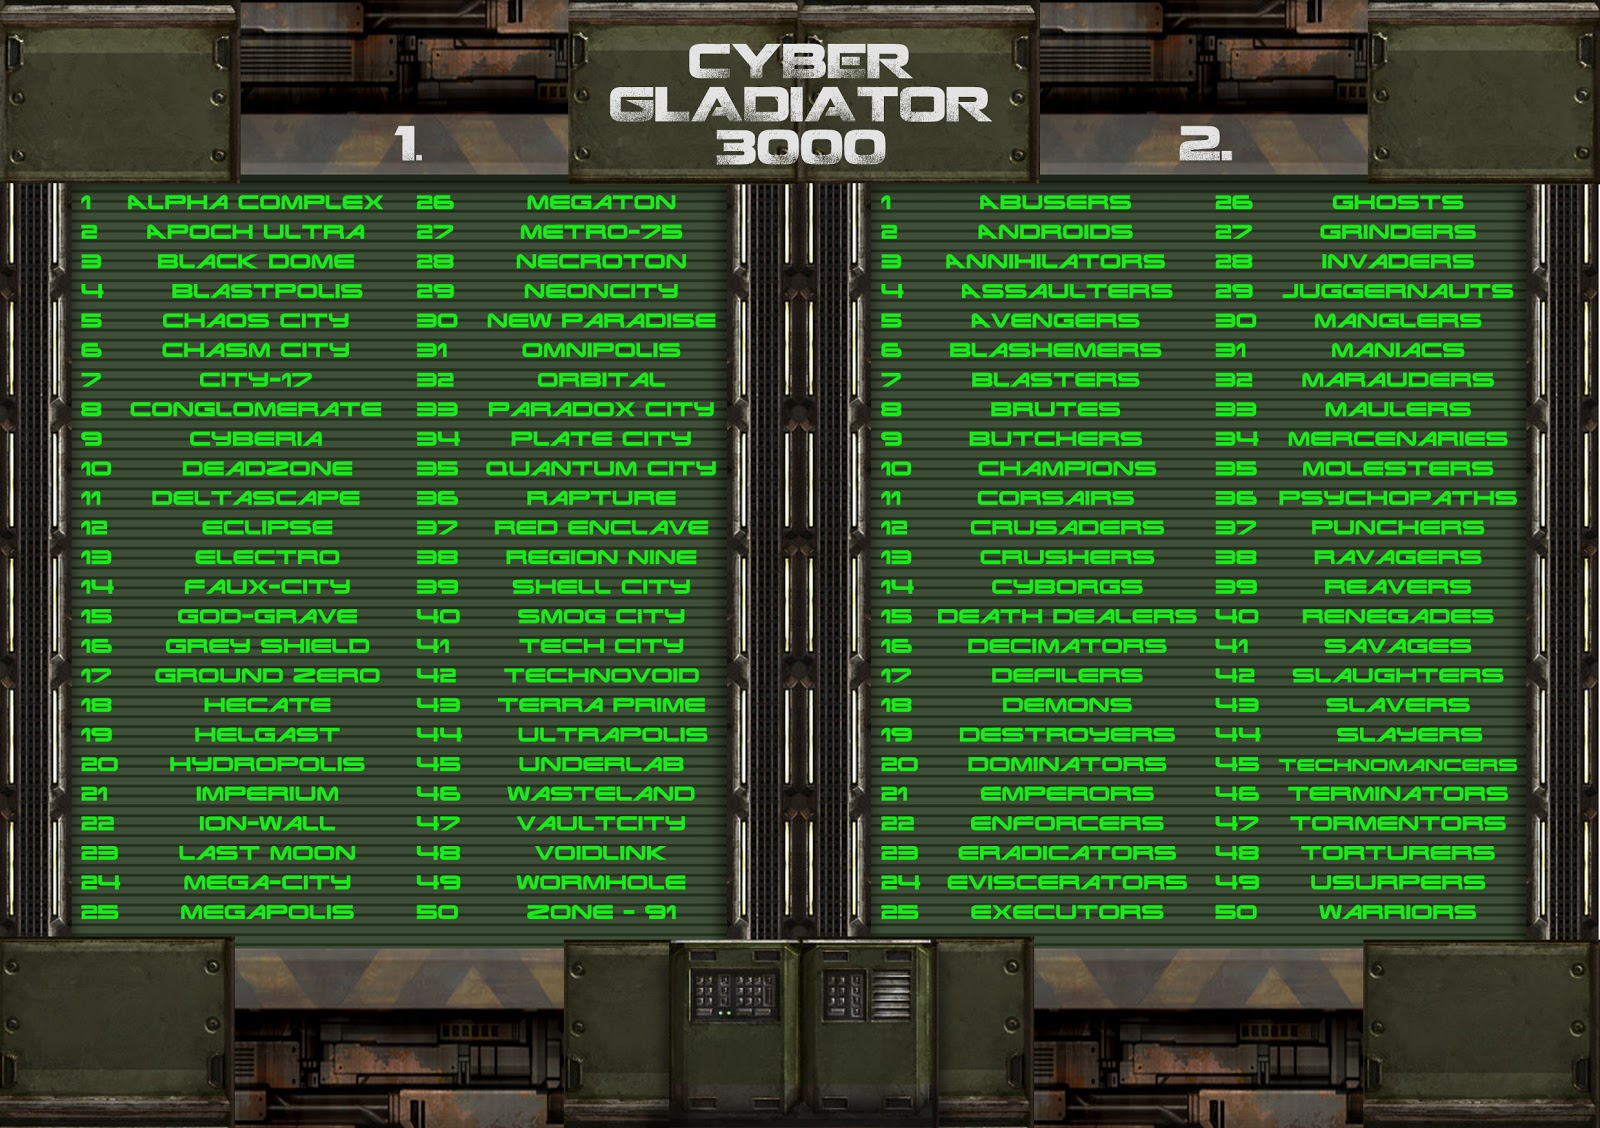 Cyber Gladiator 3000